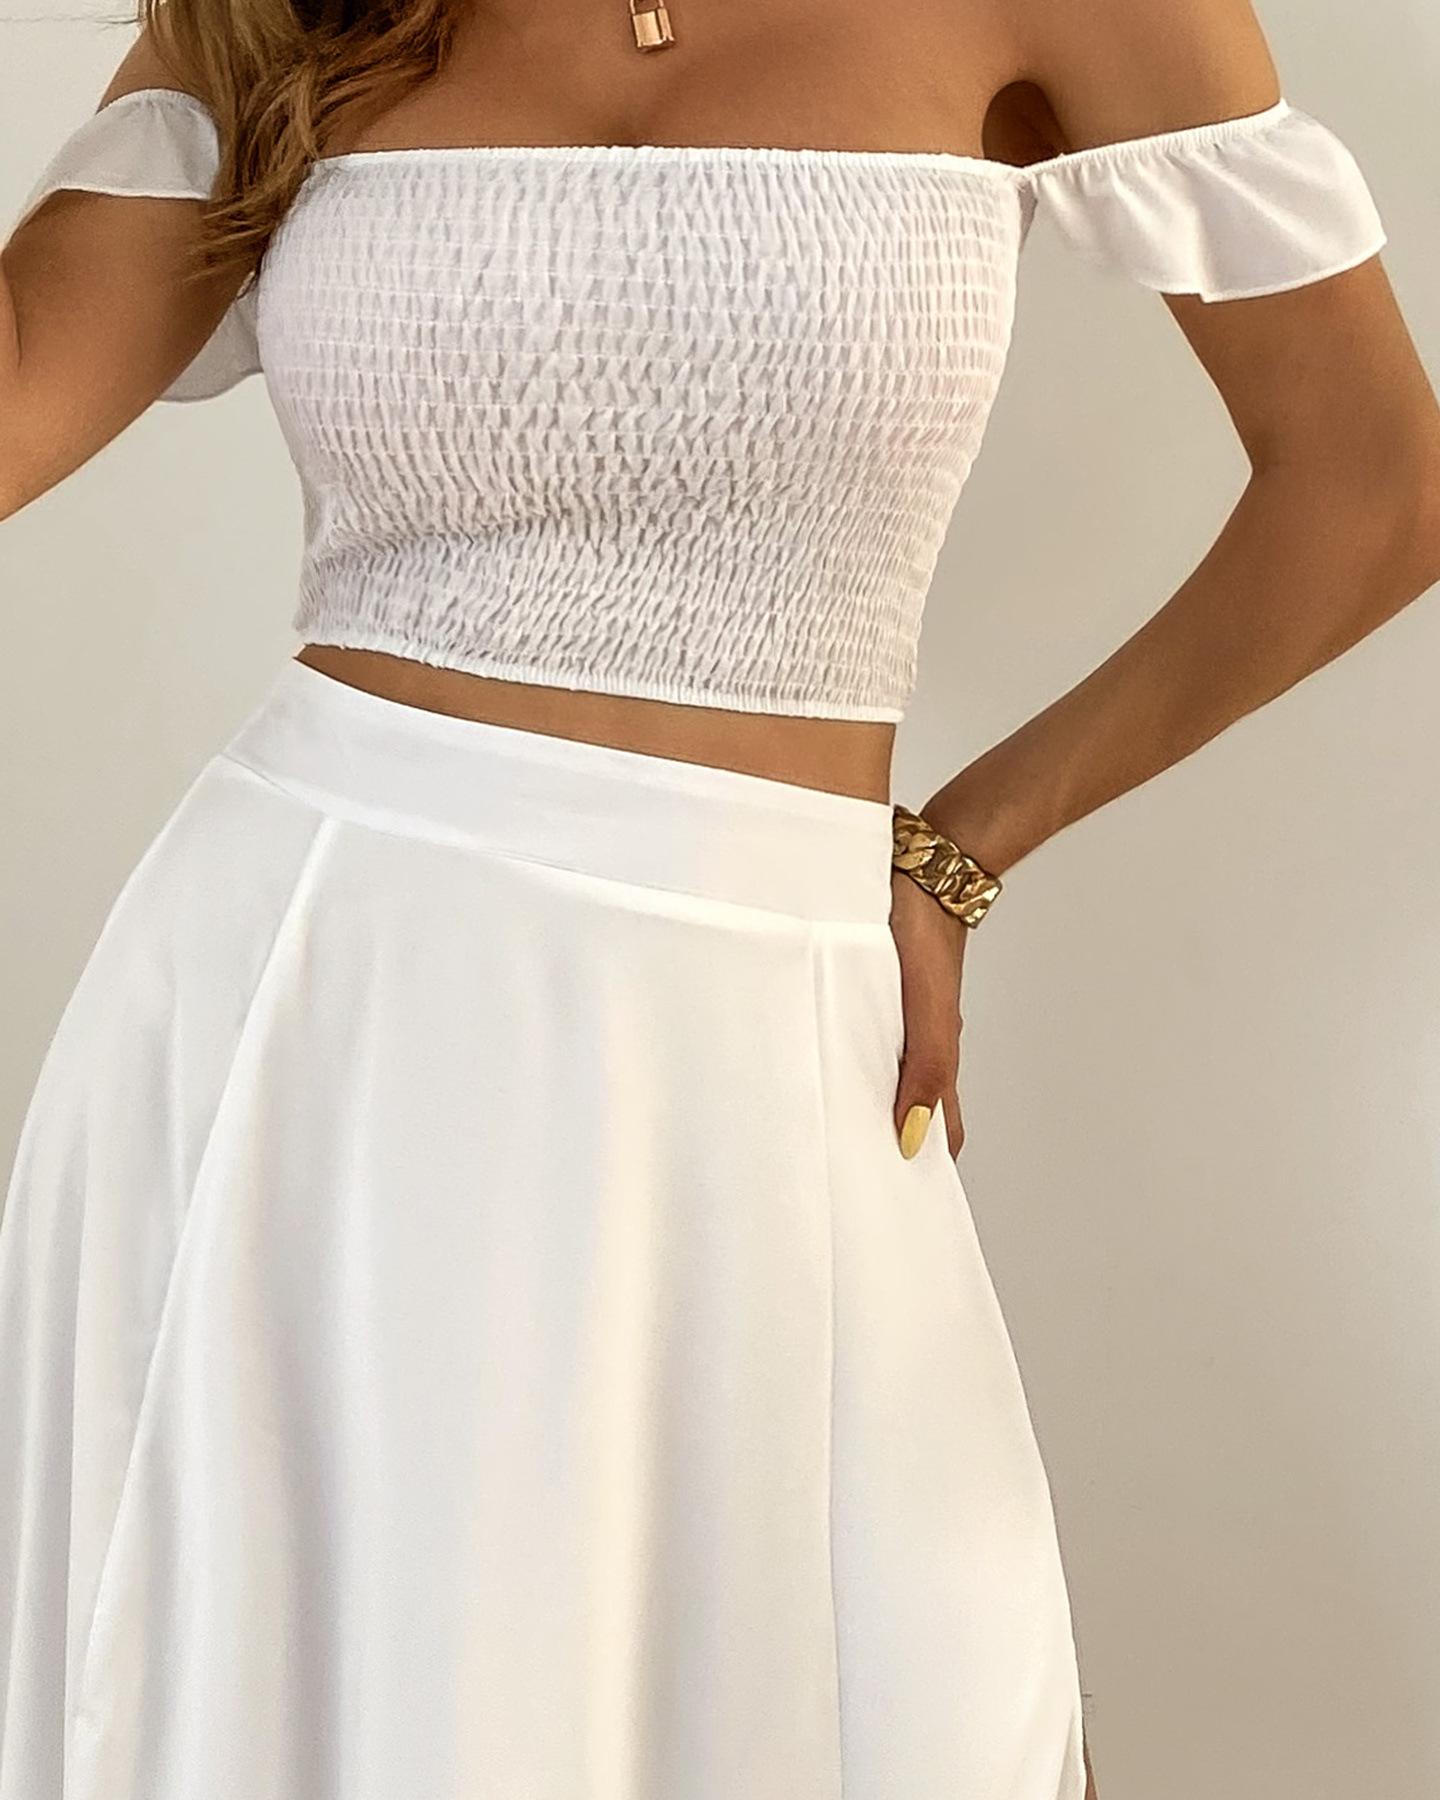 bohemian print mid-length retro tube top skirt set NSFM59021